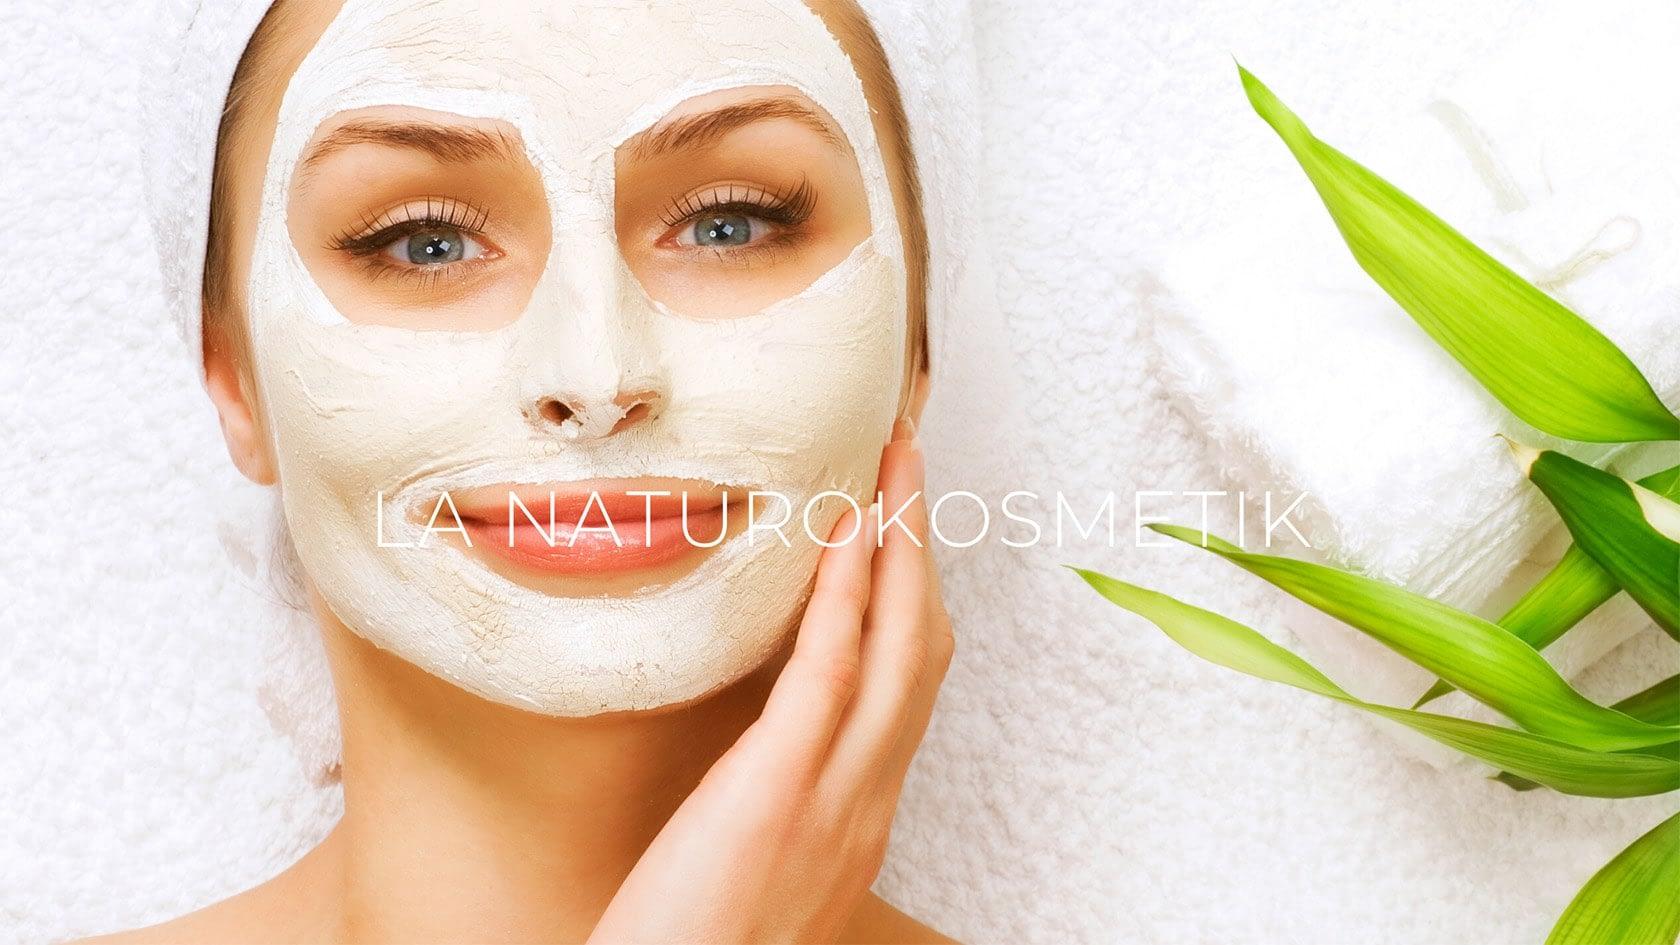 Qu'est-ce que la naturokosmetik